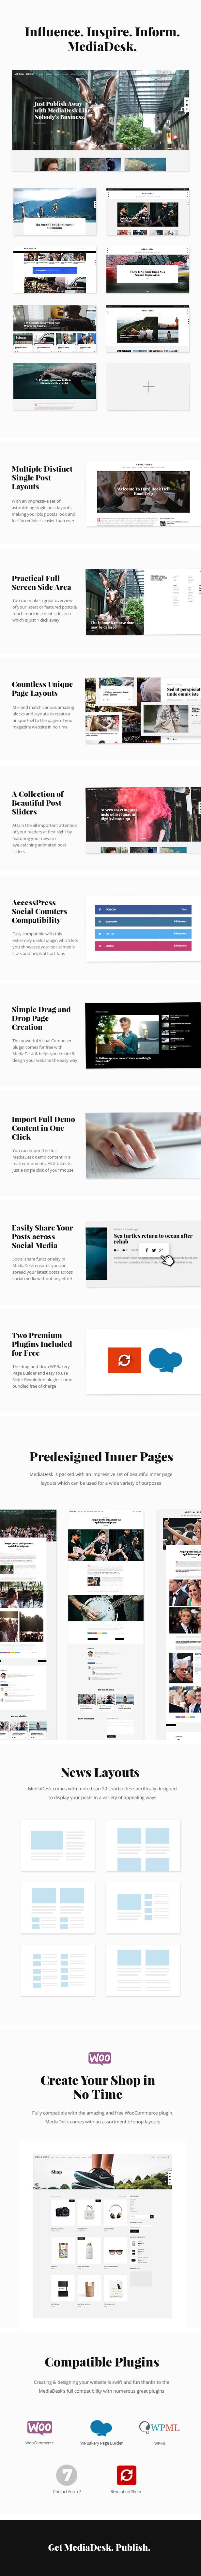 MediaDesk - Magazine WordPress Theme - 1